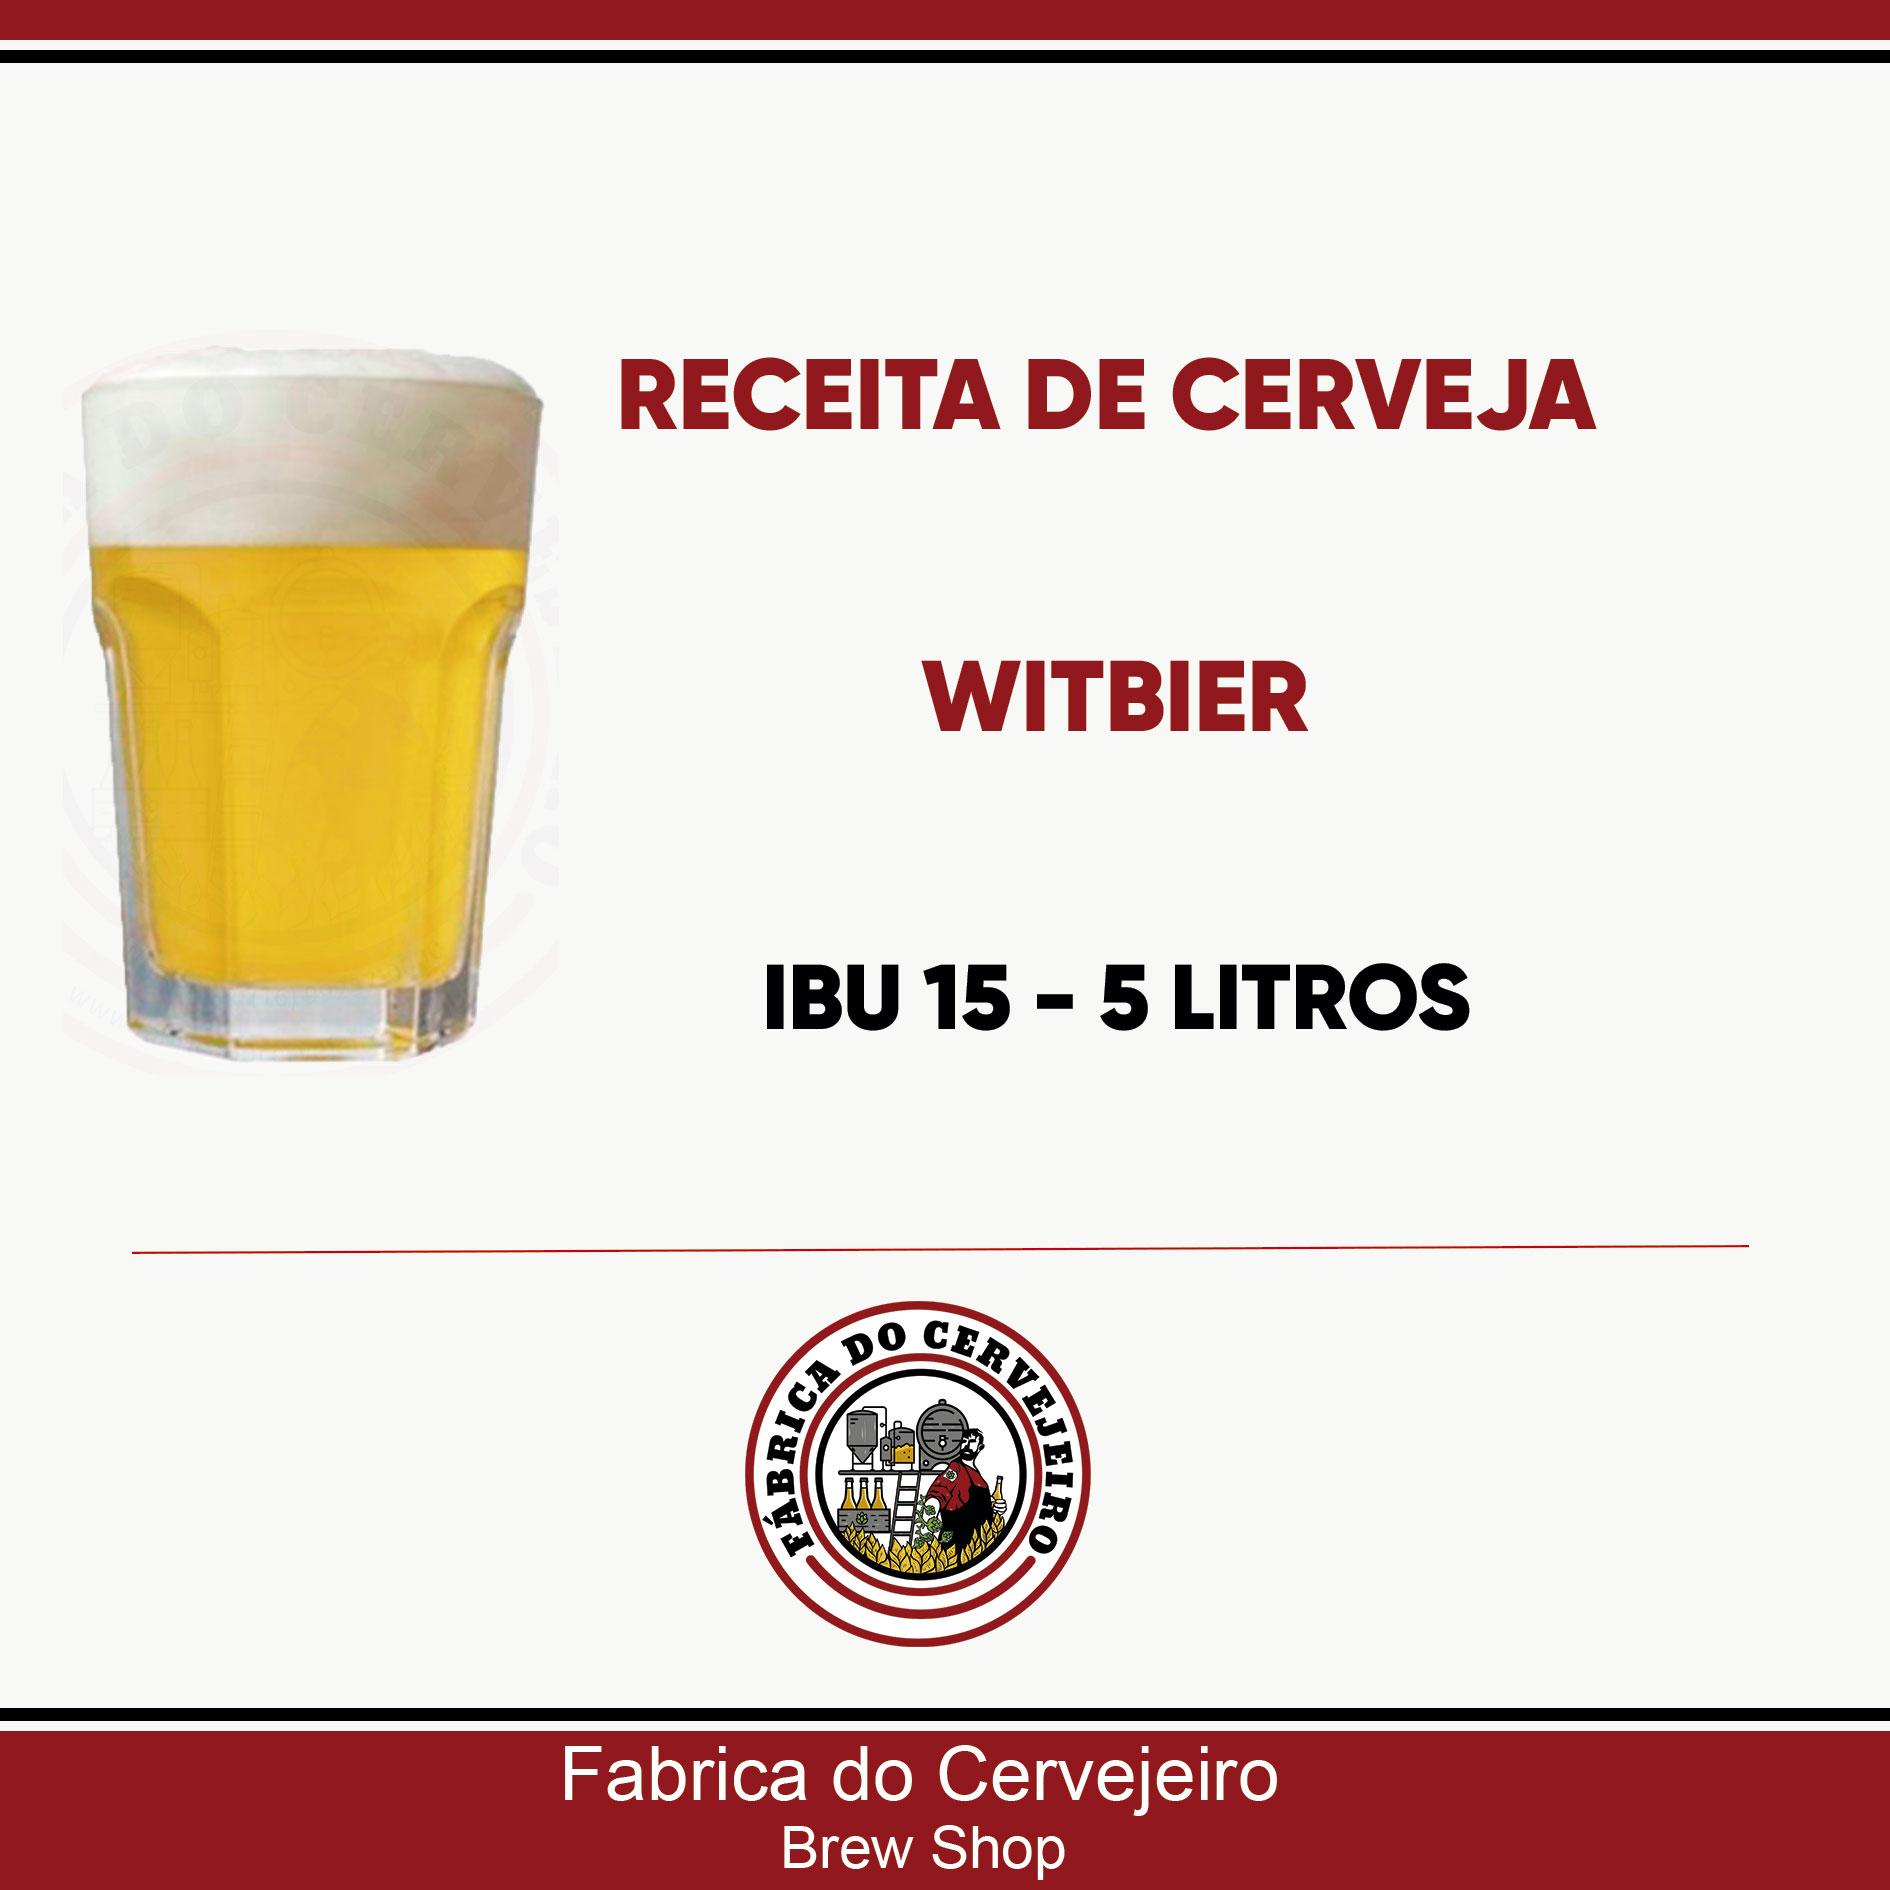 Receita de Witbier 5 Litros